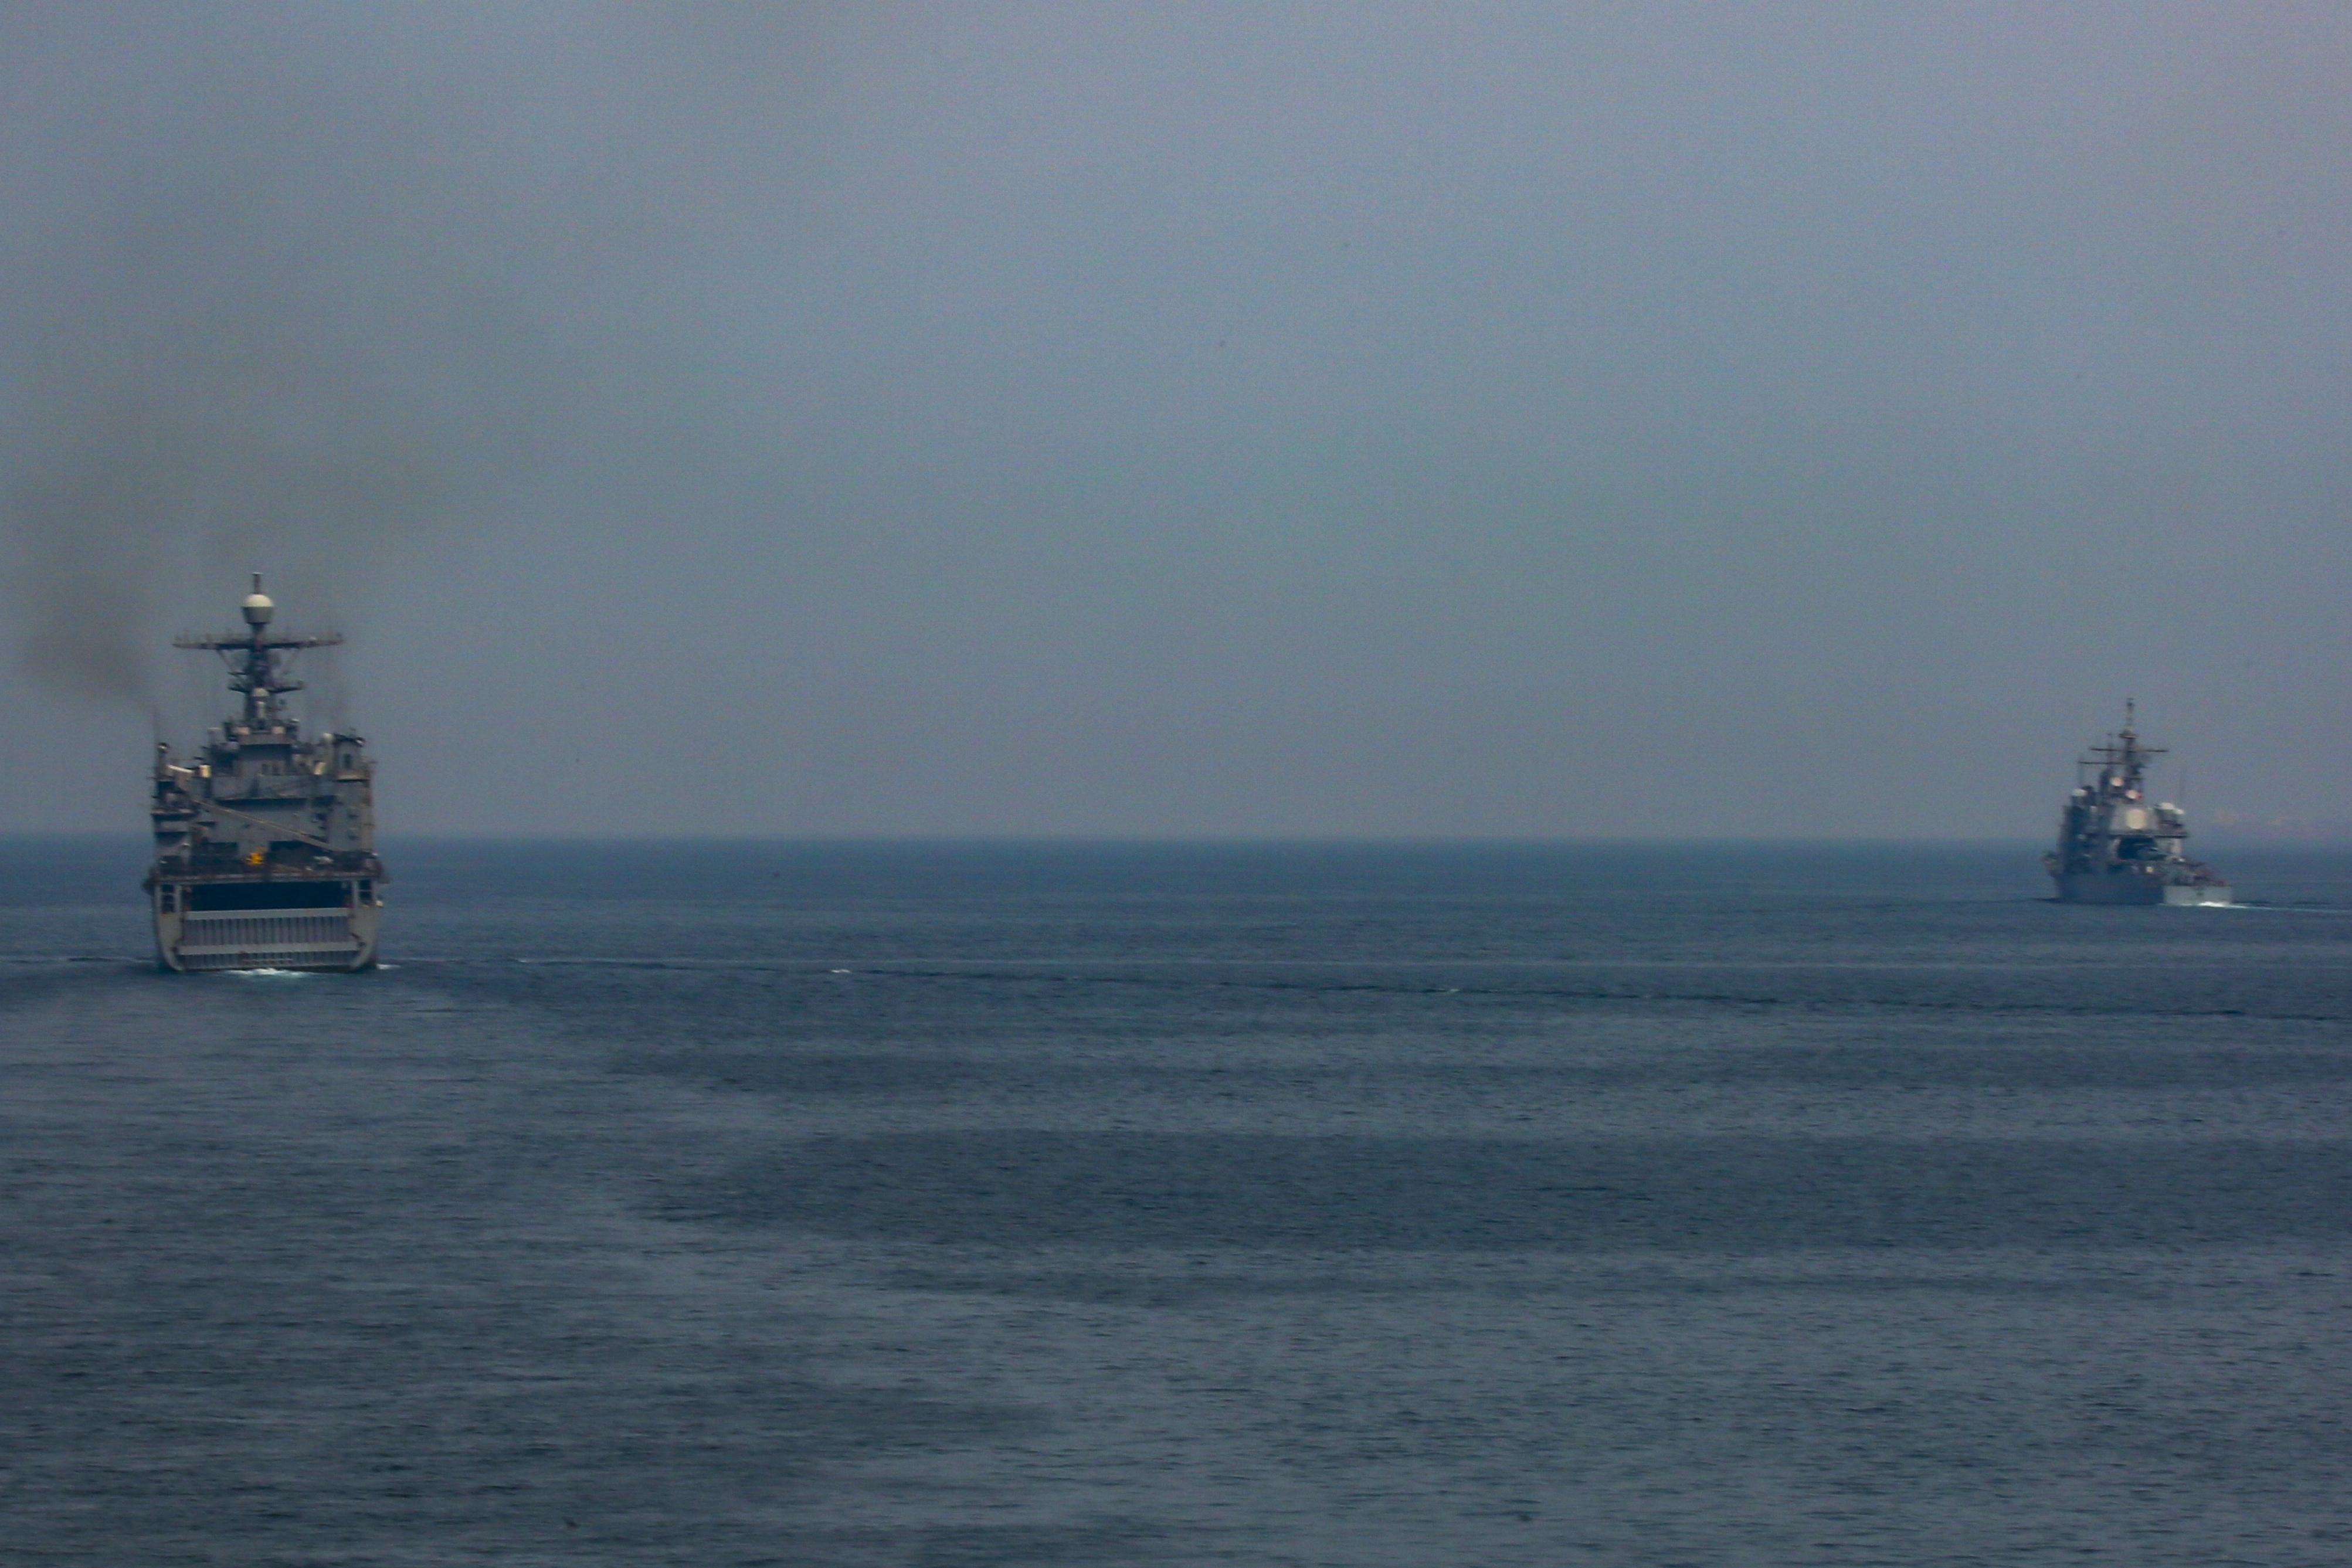 USS Oak Hill (LSD 51), left, and guided-missile cruiser USS Vella Gulf (CG 72) transit the Strait of Hormuz